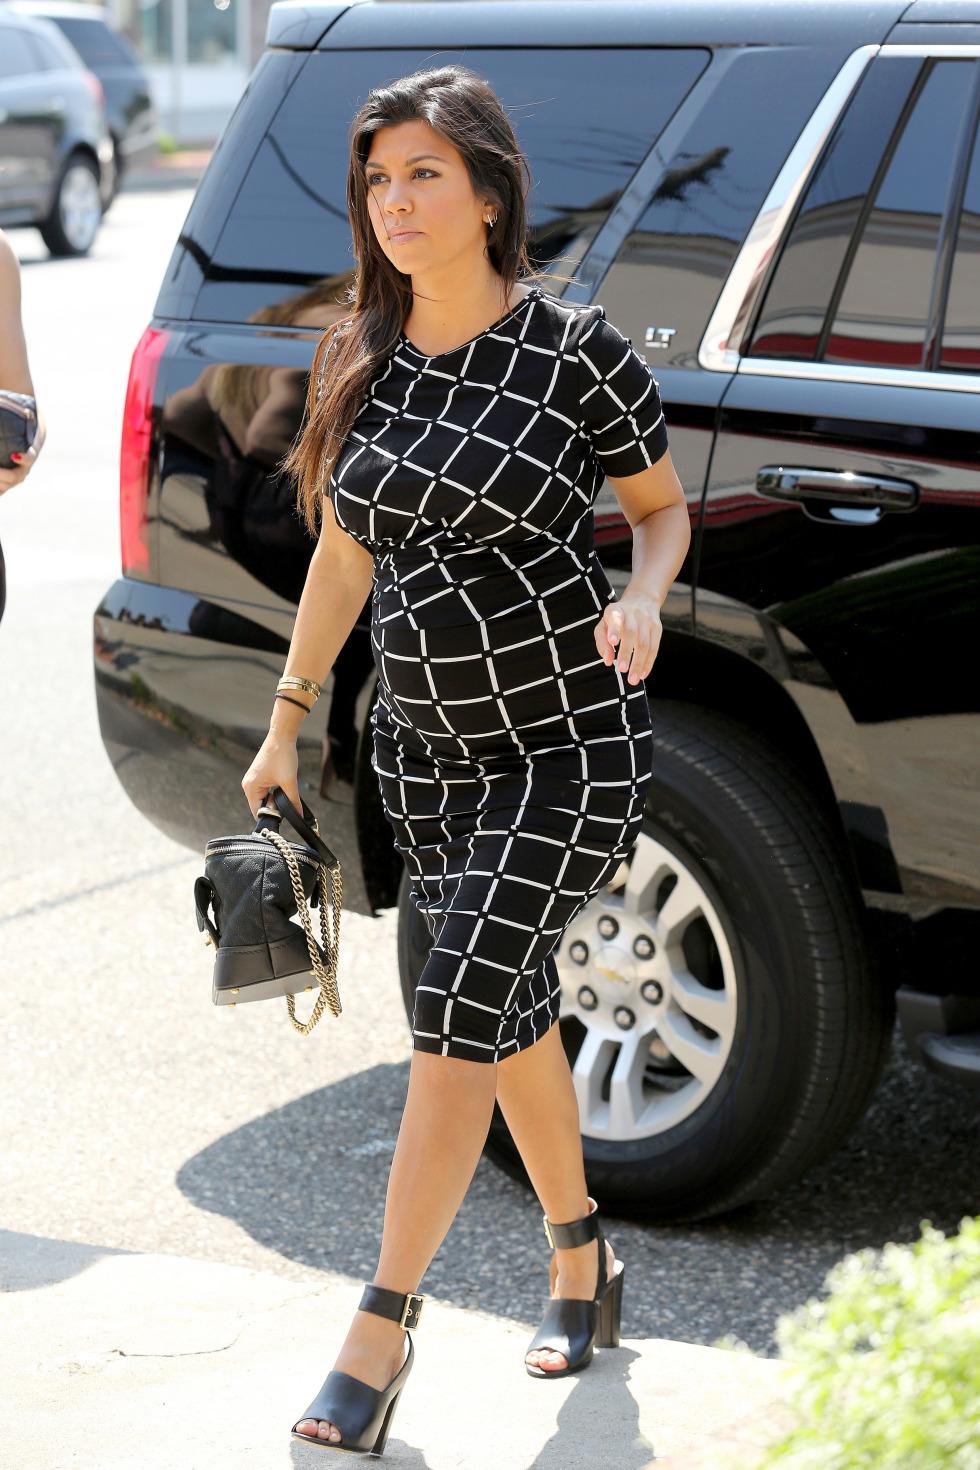 Kourtney Kardashian 39 S Maternity Style Celebrity Photos Fashion